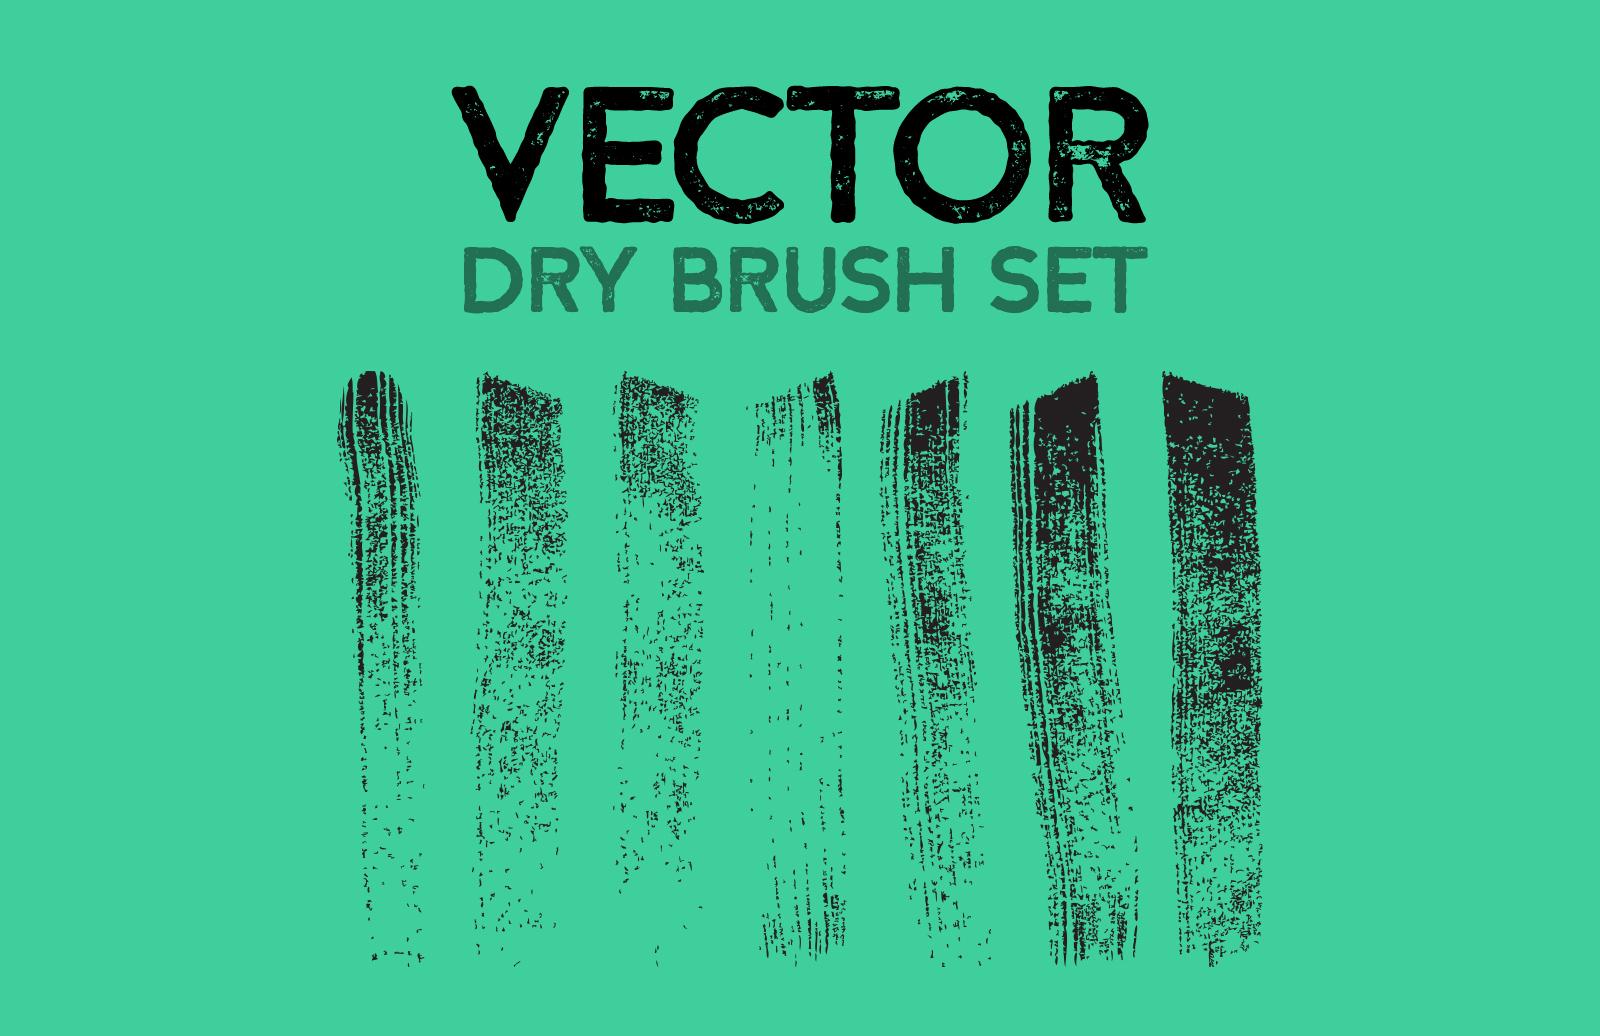 Vector Dry Brush Set 1